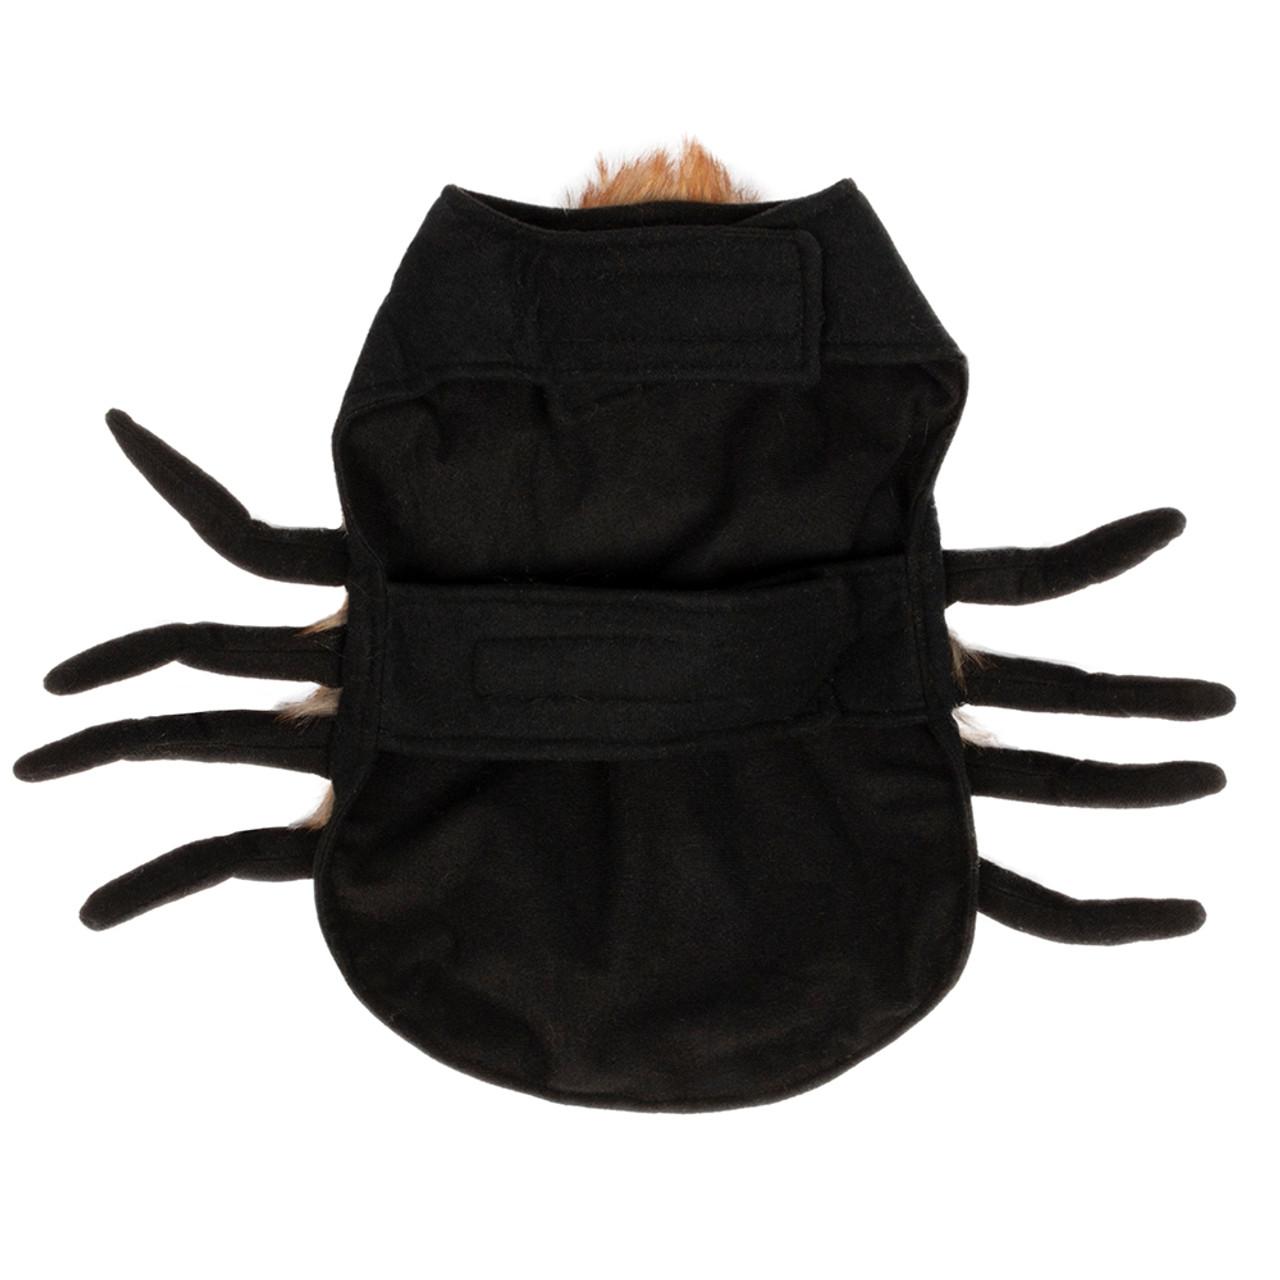 SimplyDog Halloween Spider Dog Costume - Back